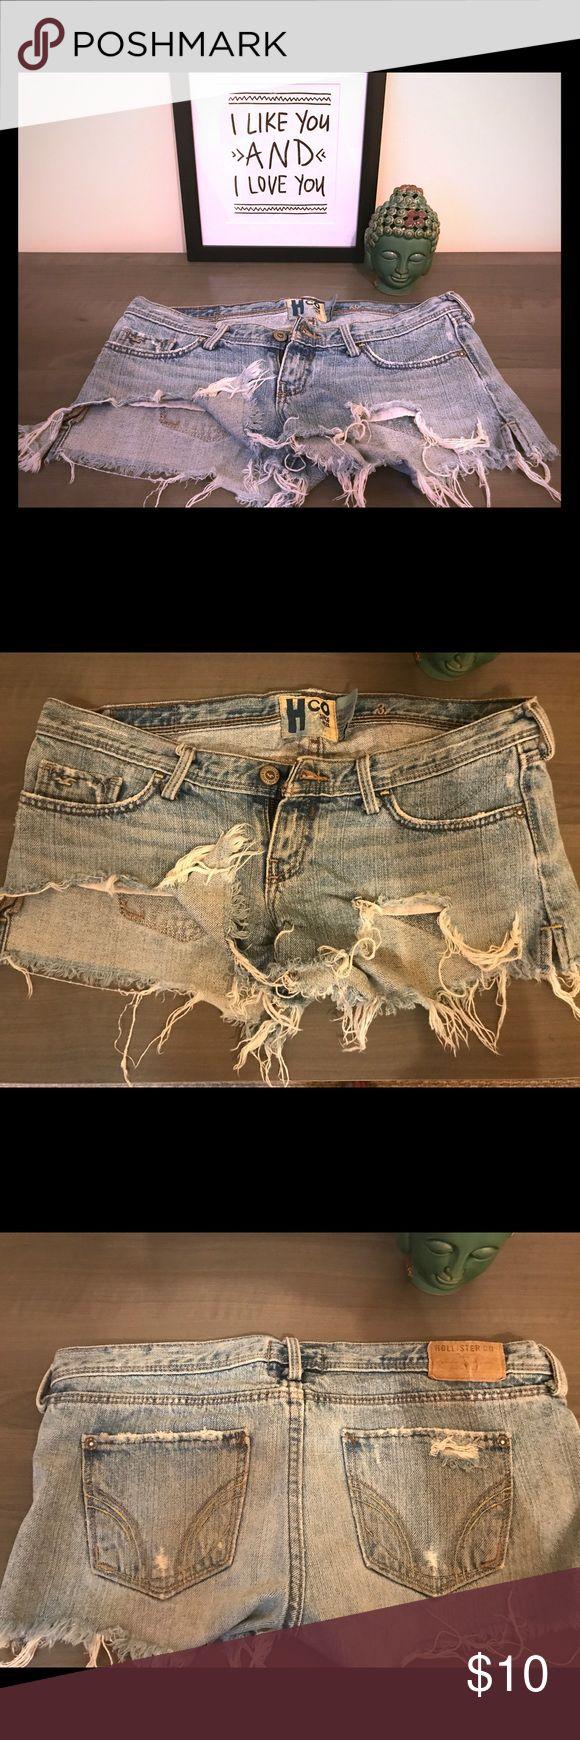 HOLLISTER daisy duke shorts HOLLISTER Jean shorts, short, lower waist, ripped look. Size 0 Hollister Shorts Jean Shorts